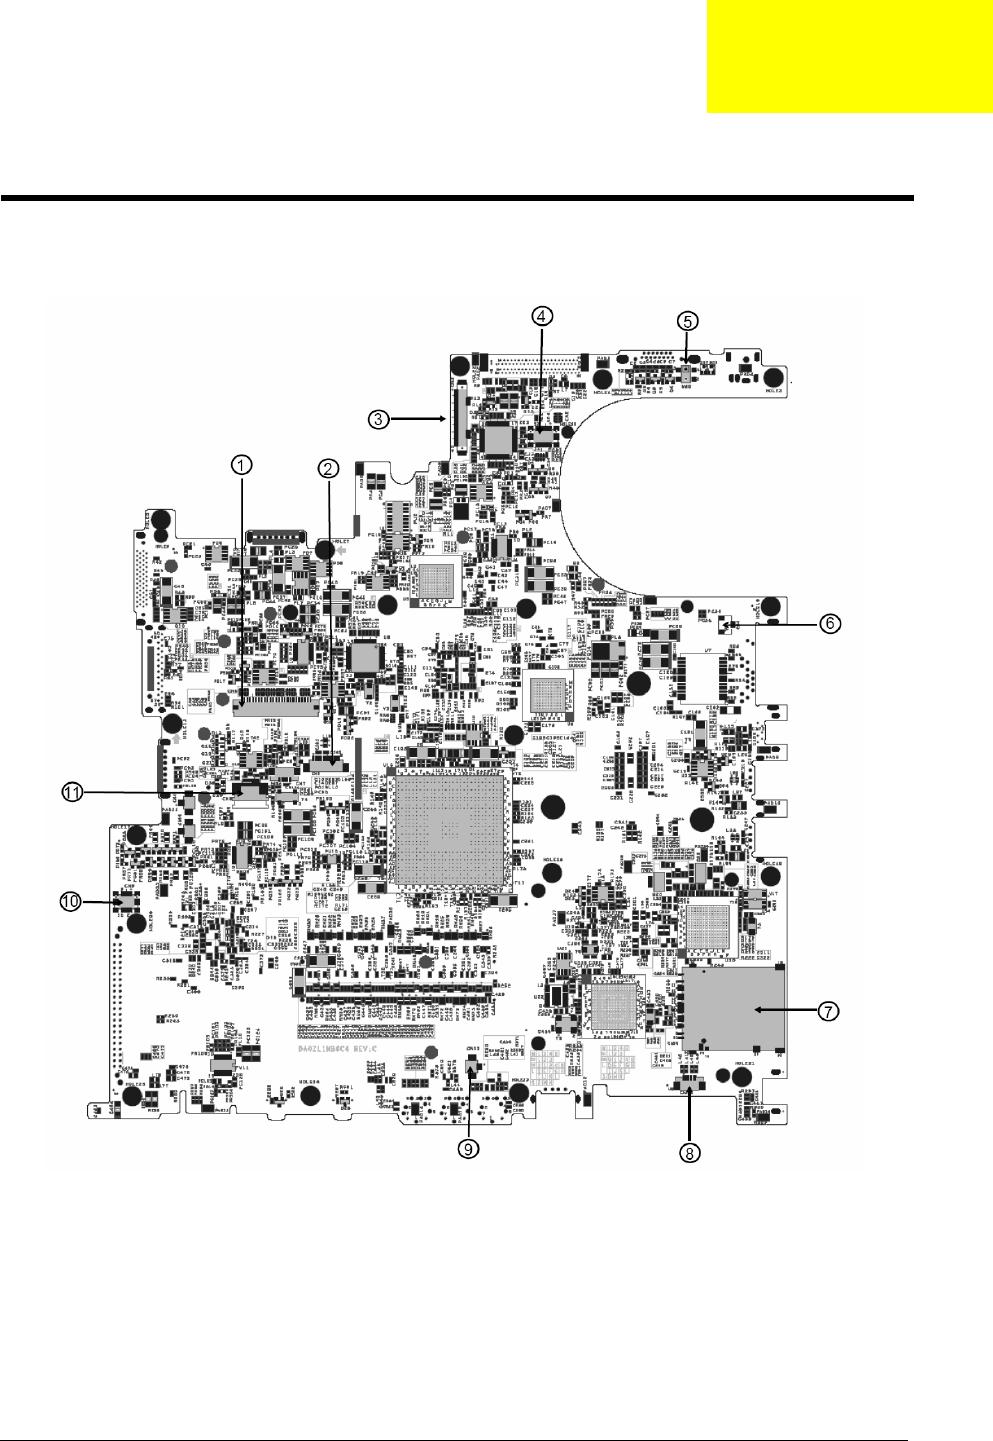 Acer 4000 Users Manual Sg Tm2300 Tm4000 Tm4500 Logitech Z 2300 Circuit Diagram Chapter 5 93